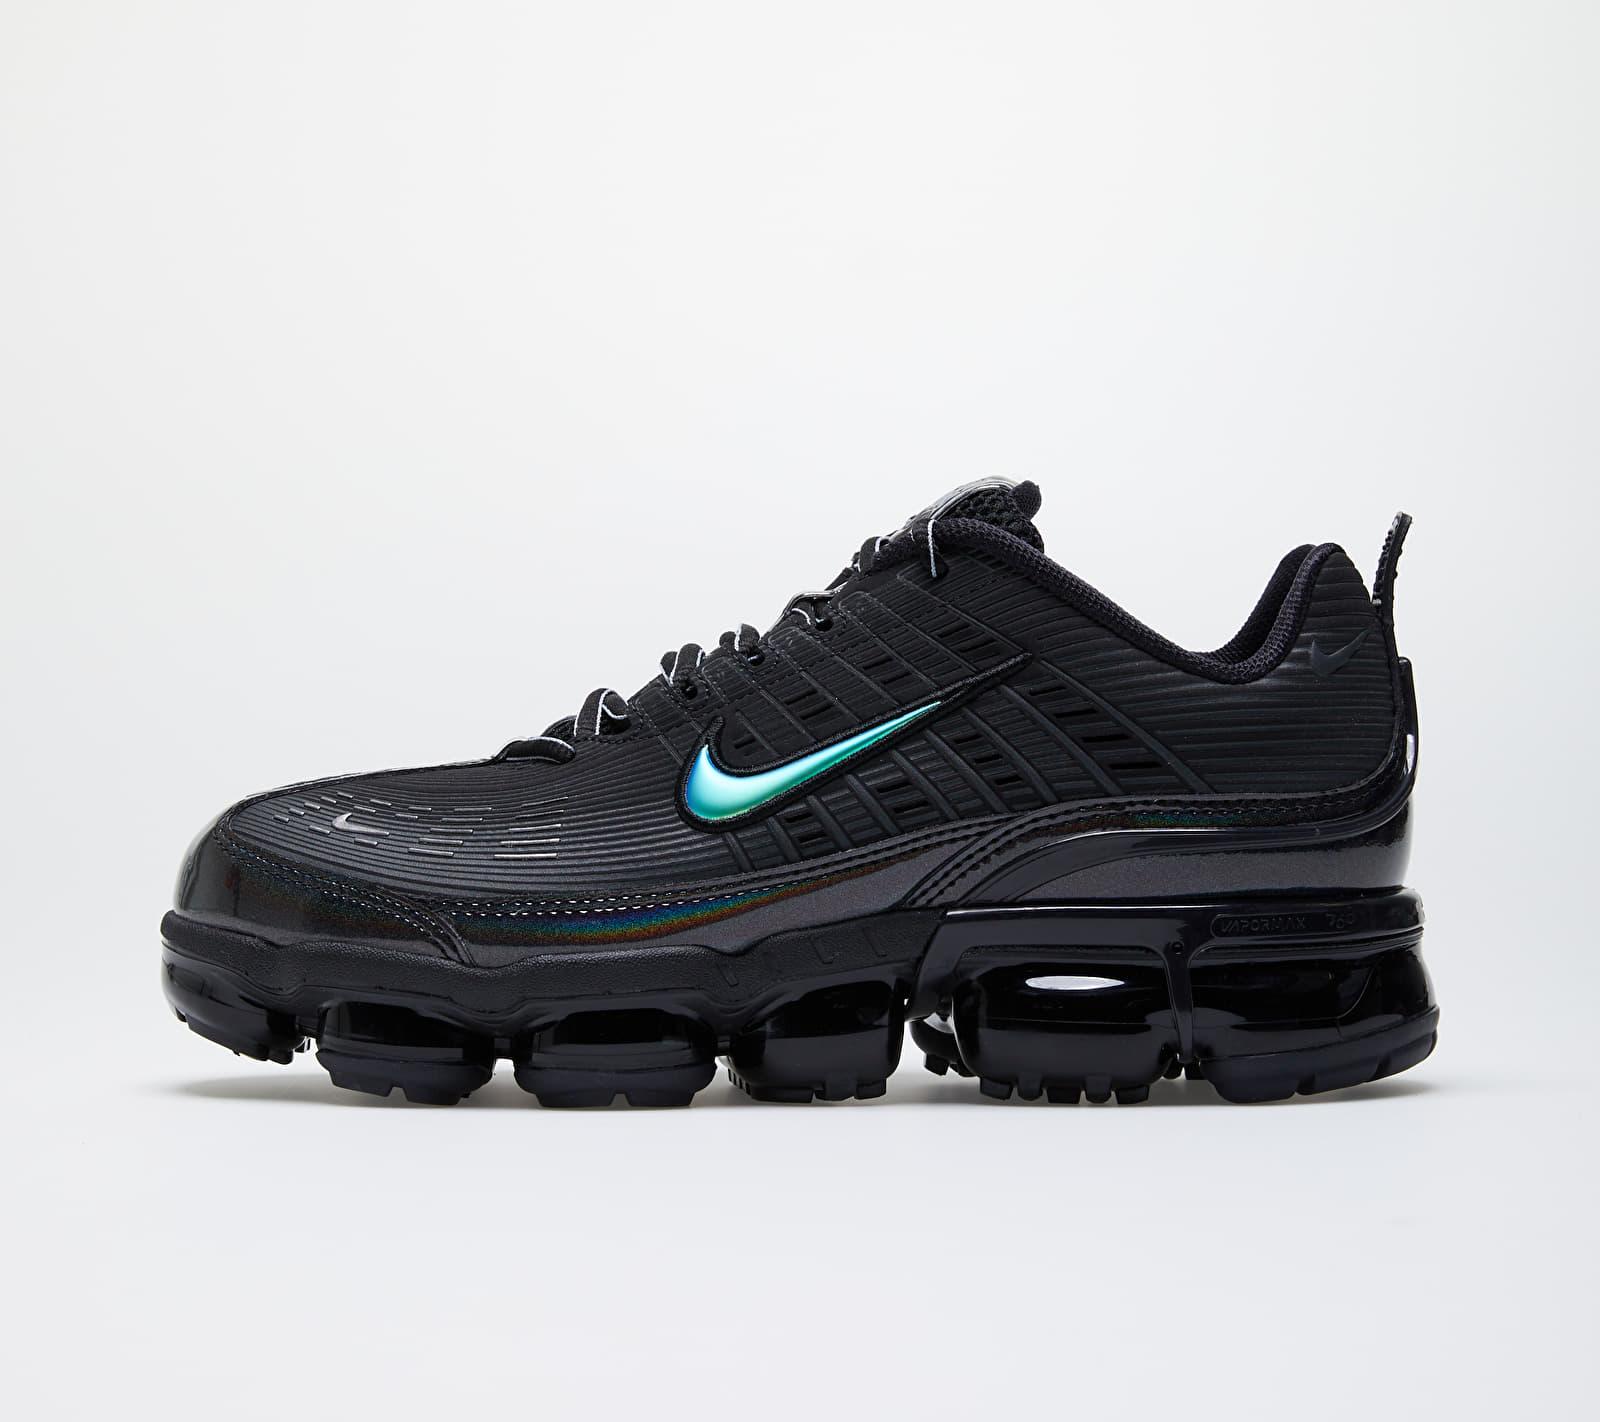 Nike Air Vapormax 360 Black/ Black-Anthracite-Black CK2718-001